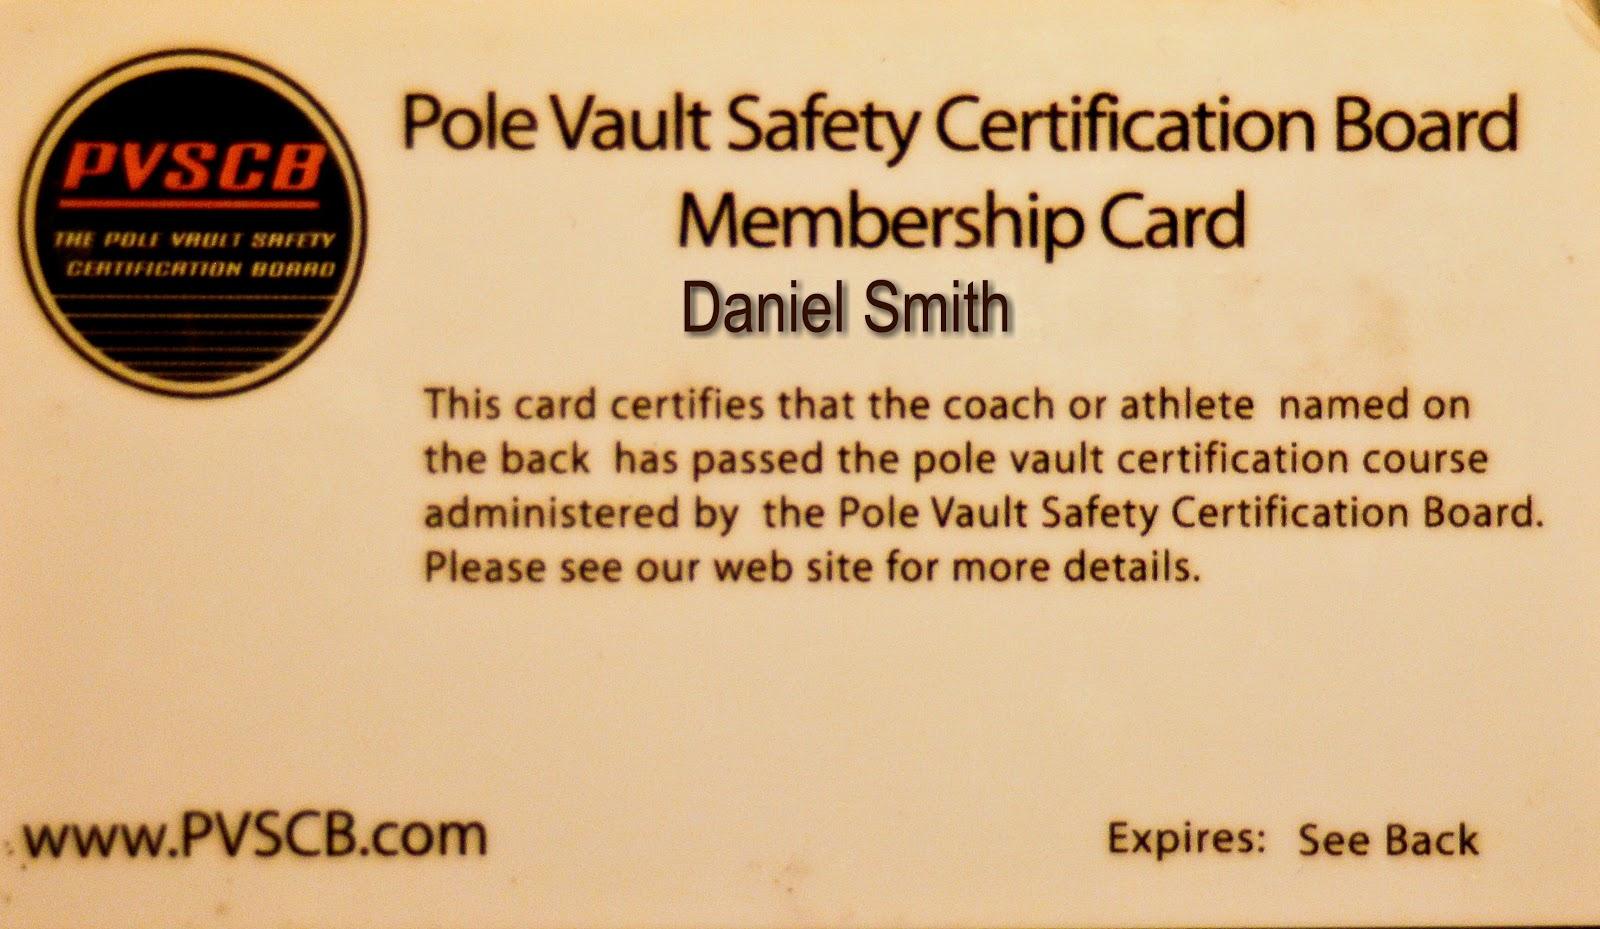 Pr triathlon team coaching certifications recognition coaches certs and recognitions xflitez Choice Image